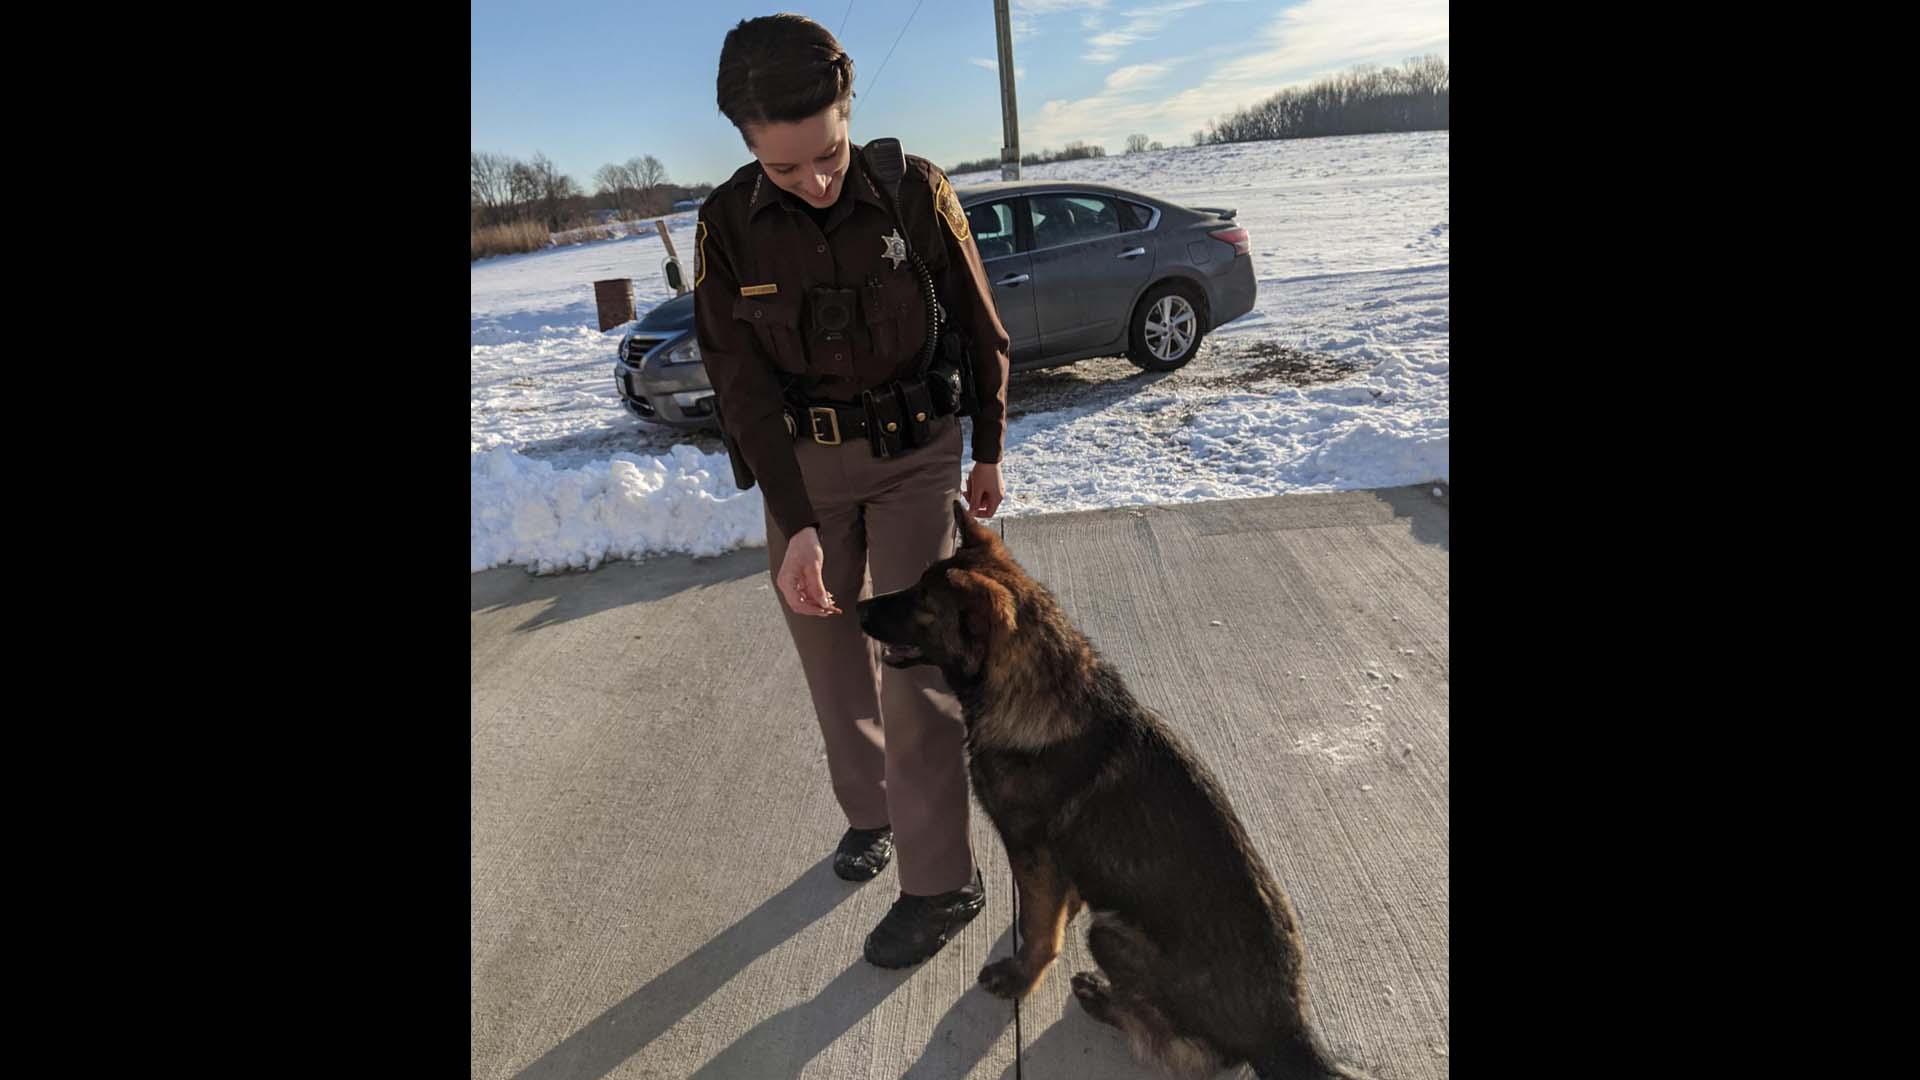 Cass County Sheriff's Deputy Taryn Shields and Leo the dog. (Jan. 21, 2021)